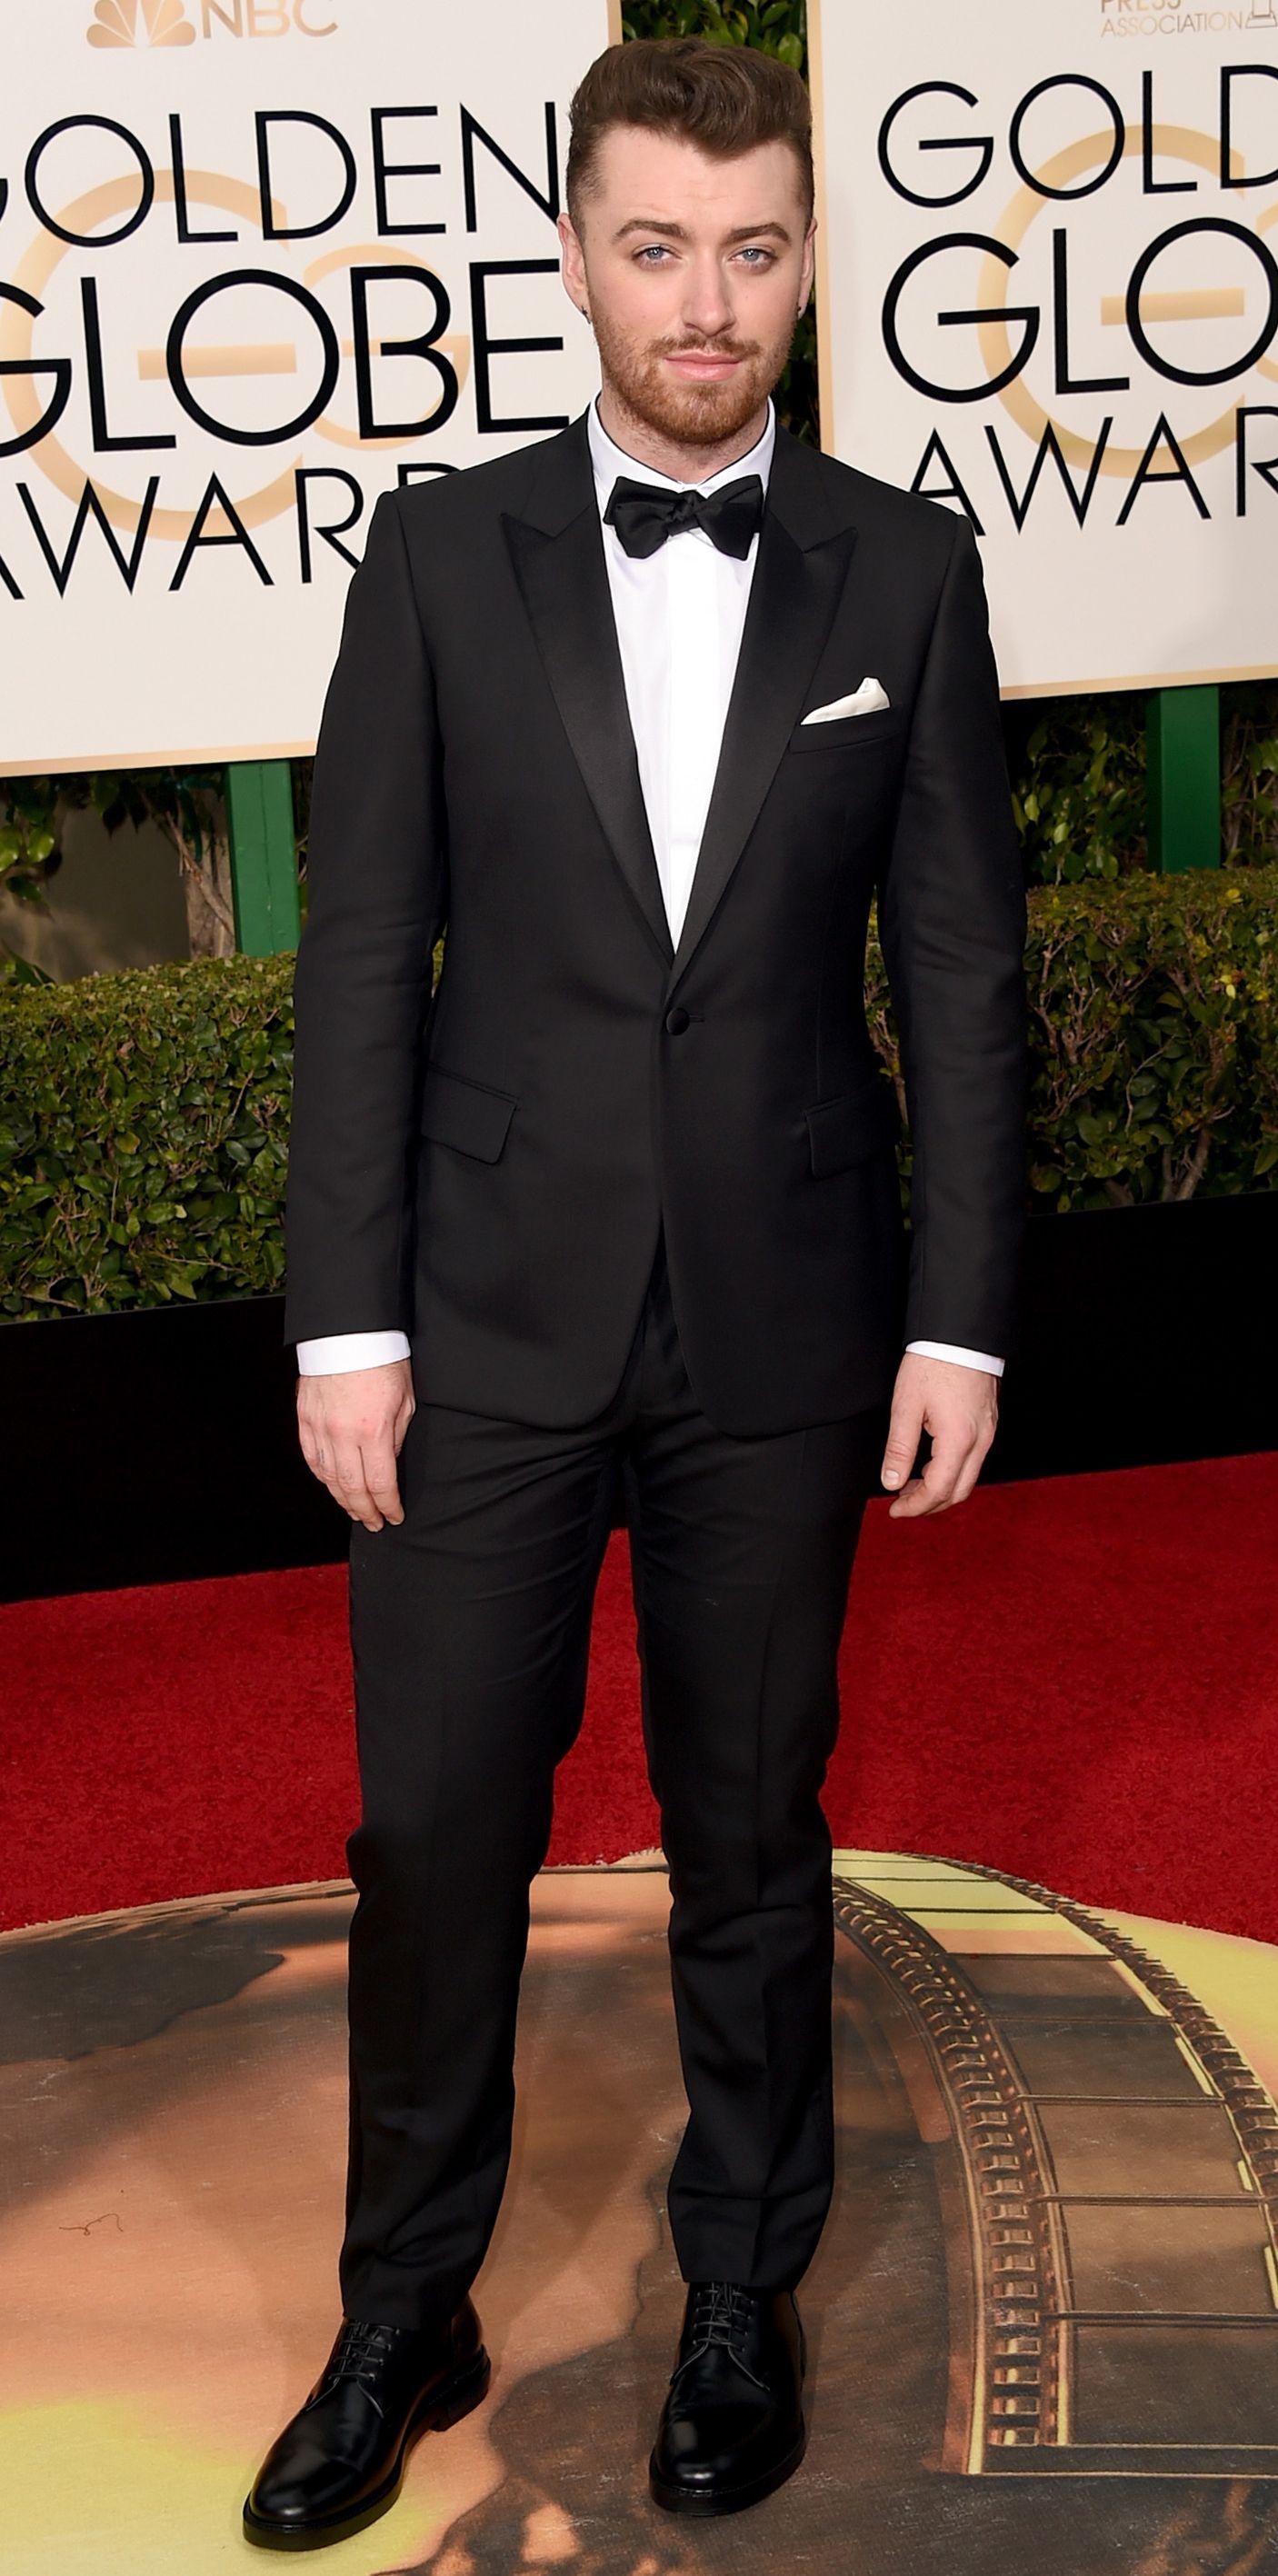 Sam Smith in a black tuxedo